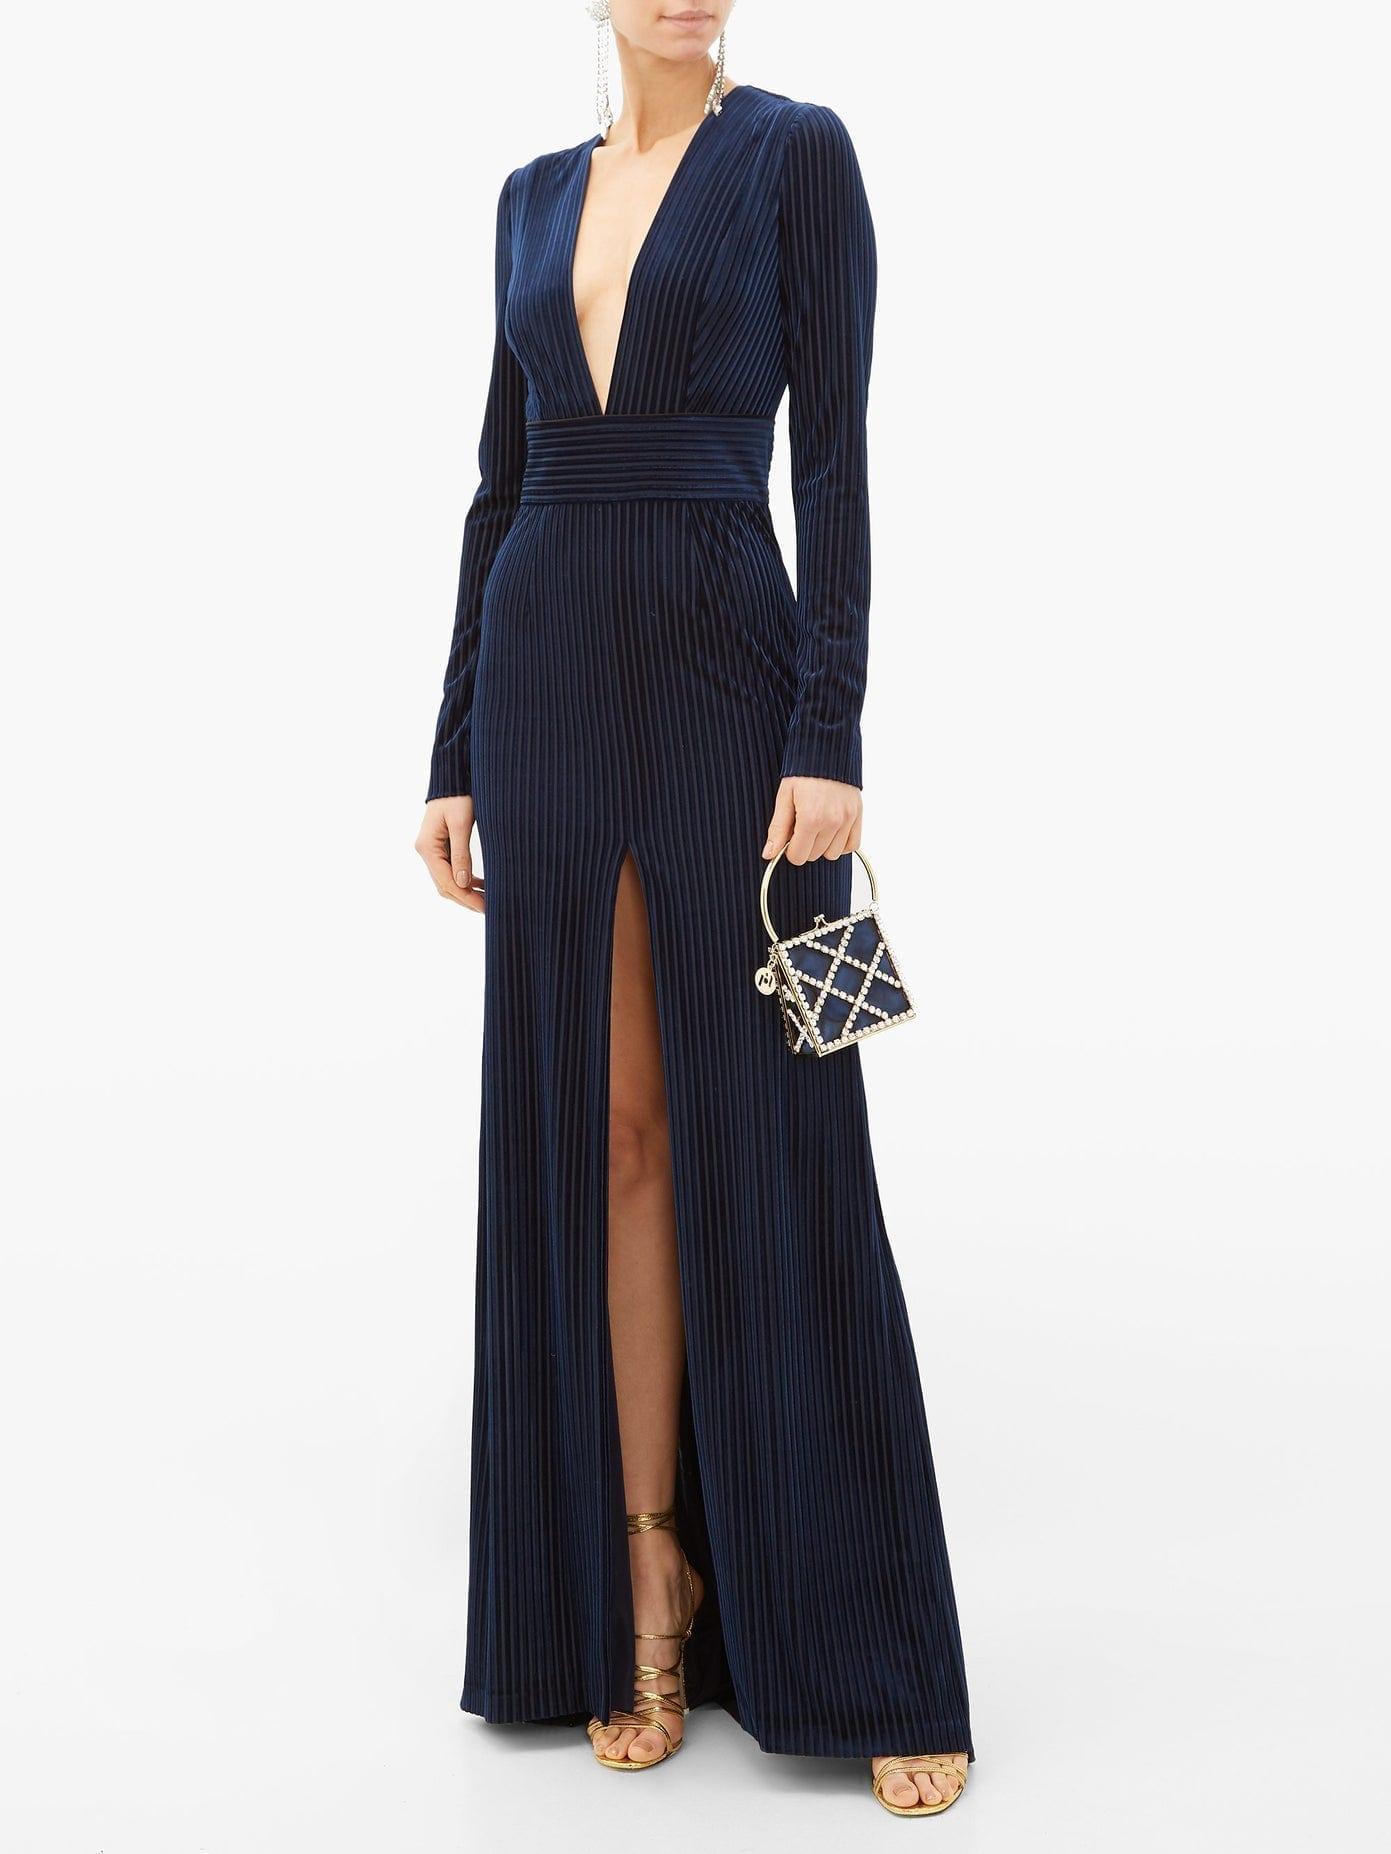 GALVAN Stardust Striped Devoré Velvet Gown